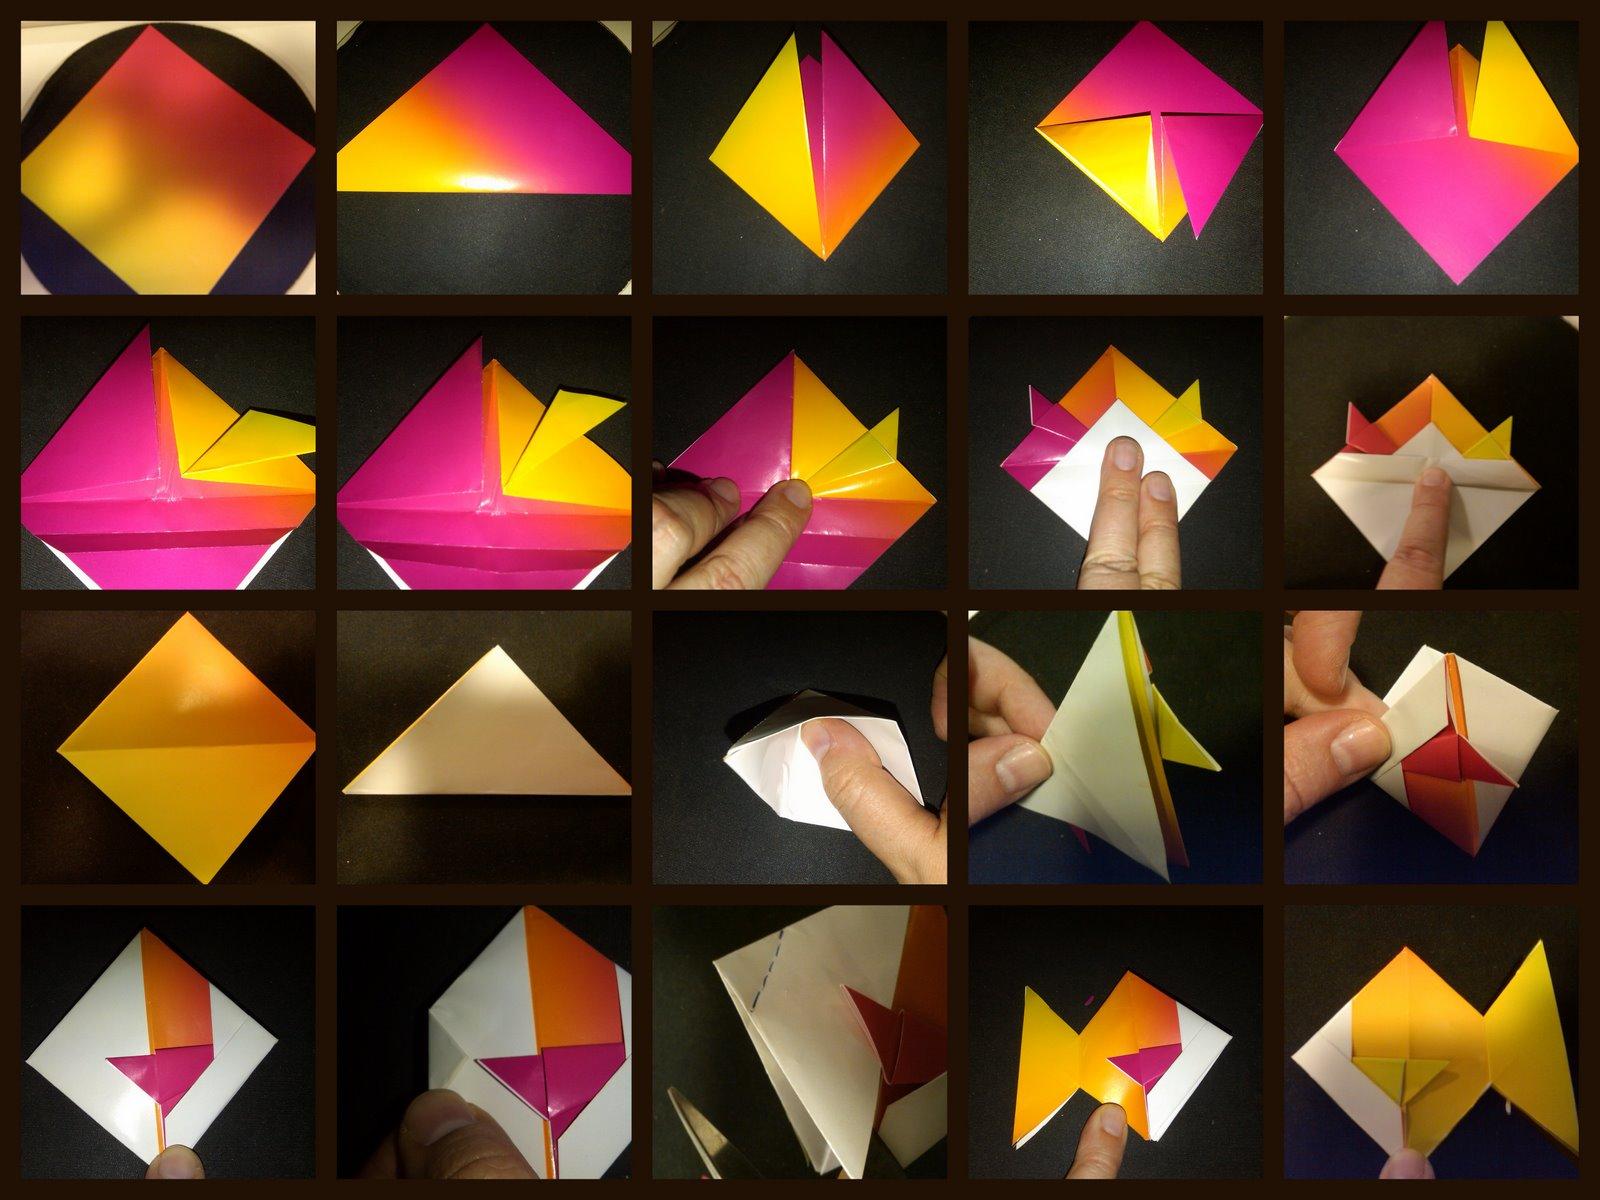 wasandres origami fisch am freitag. Black Bedroom Furniture Sets. Home Design Ideas